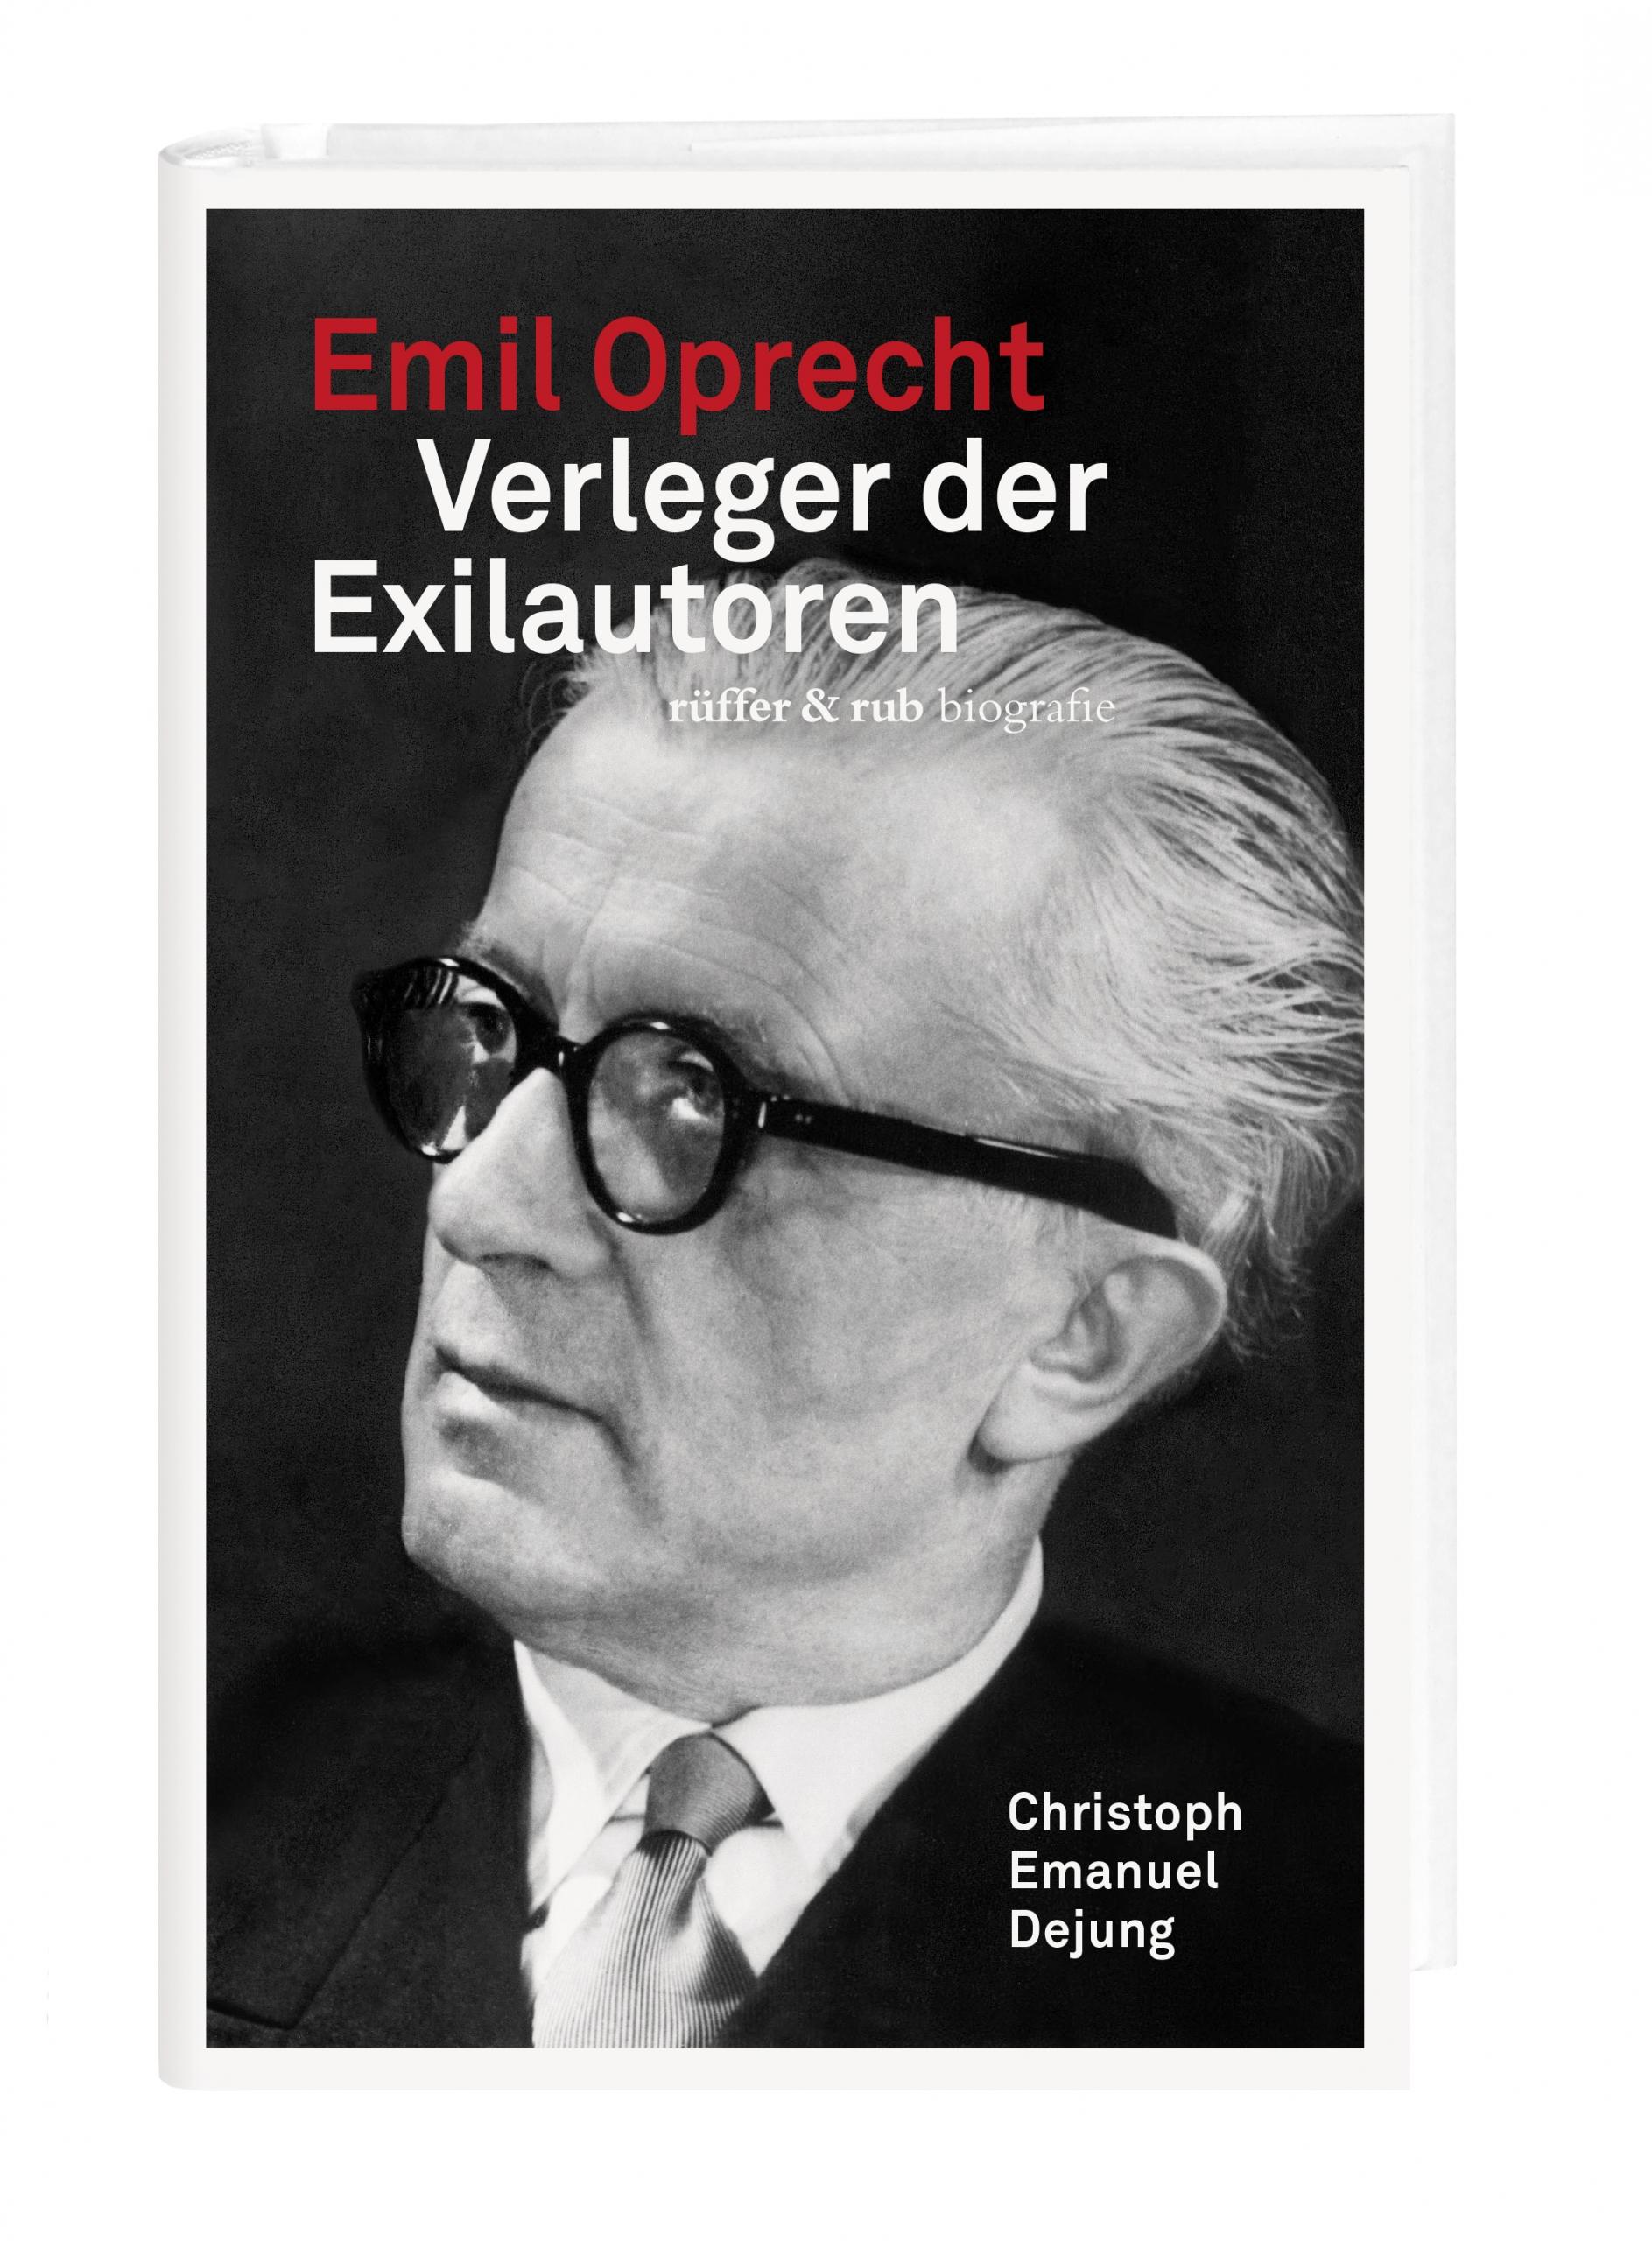 Emil Oprecht. Verleger der Exilautoren